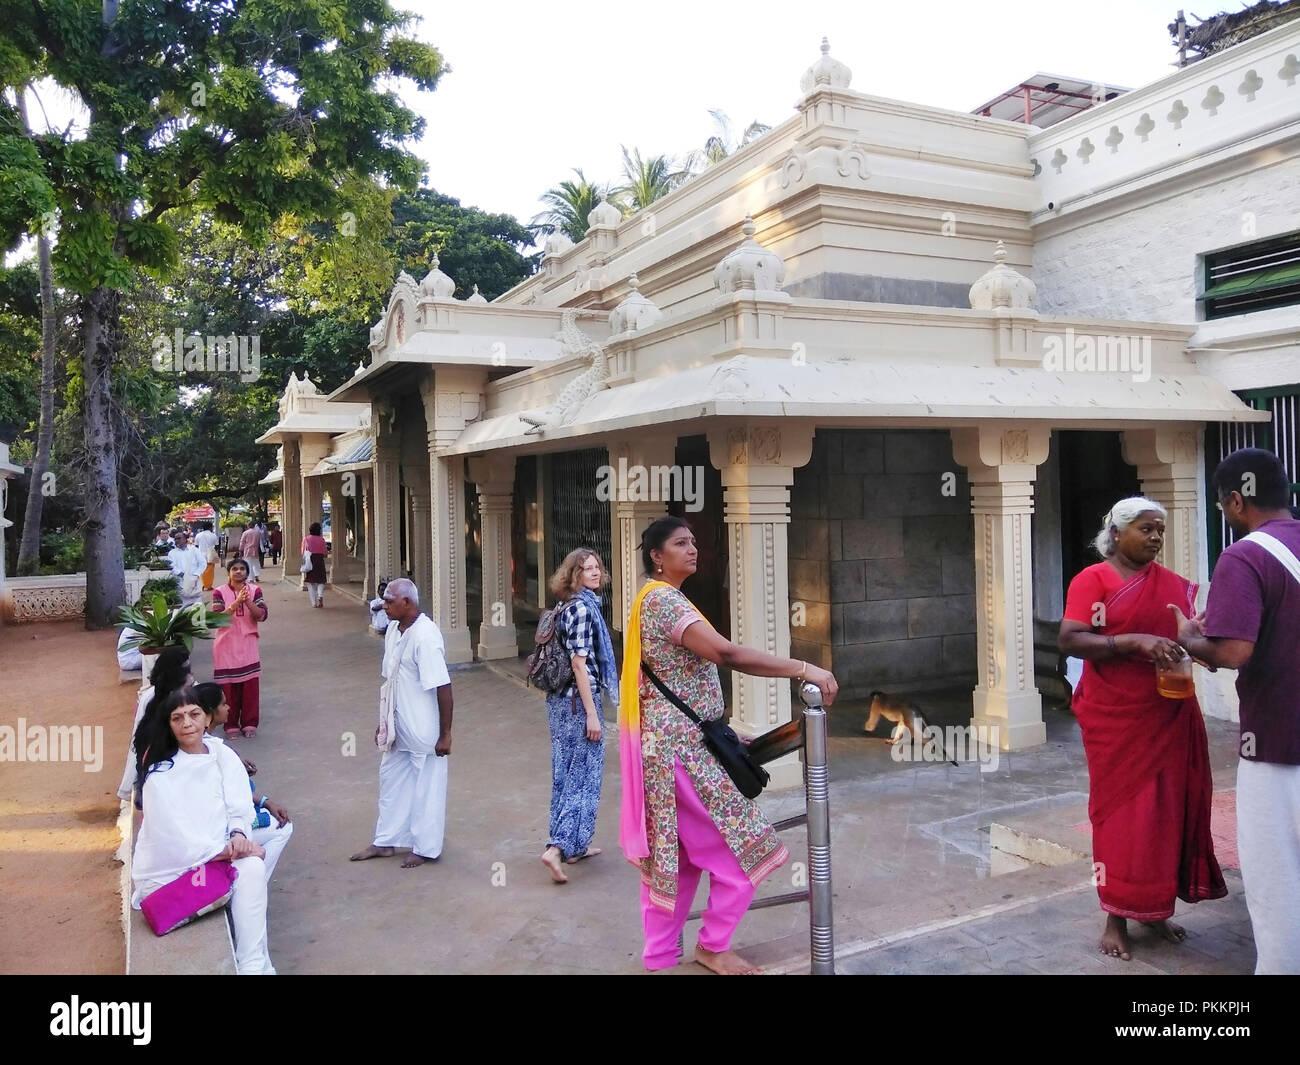 View of devotees  inside the Raman Maharishi Aashram, Thiruvannamalai, Tamil Nadu, India - Stock Image